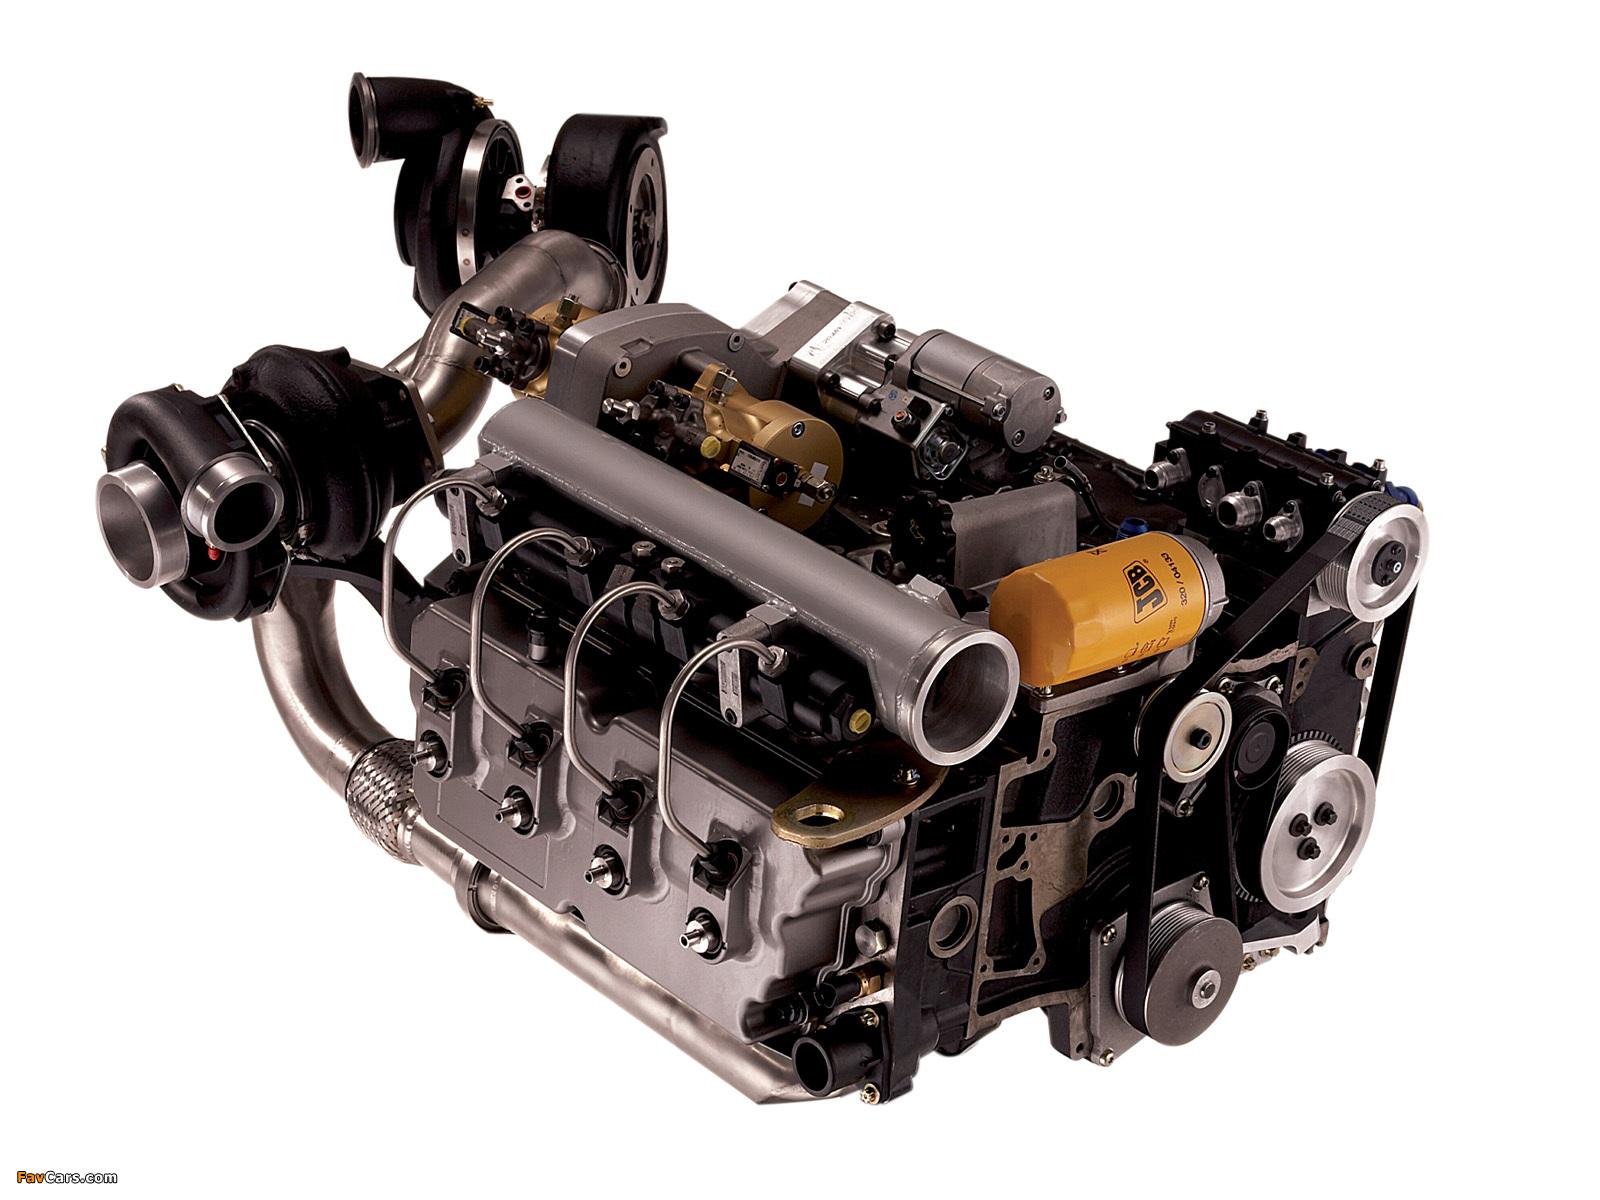 Photos of JCB Dieselmax (1600 x 1200)